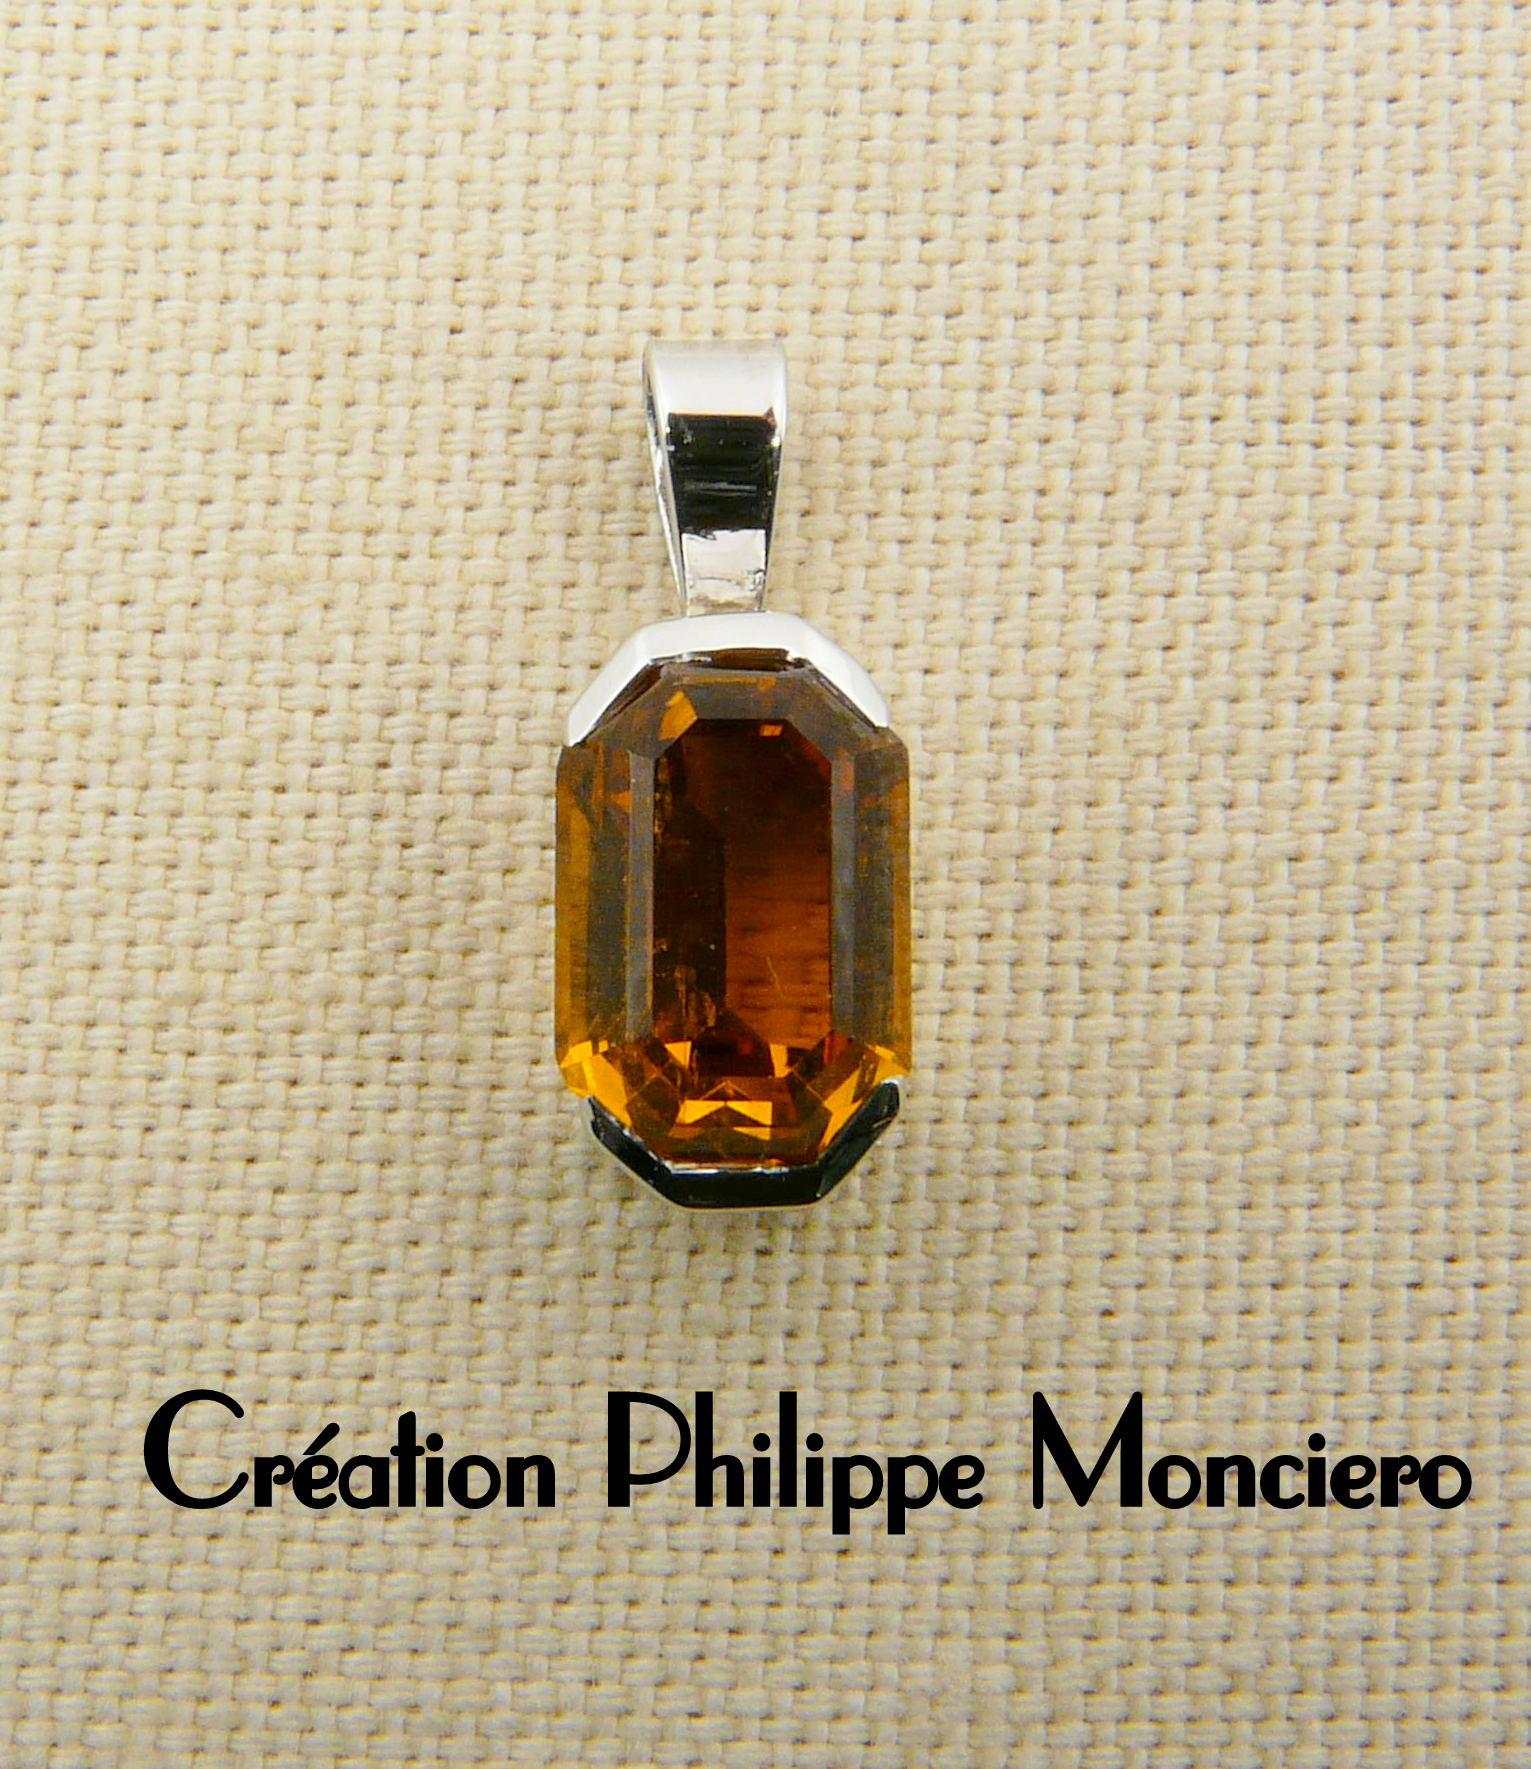 Pendentif citrine et or blanc. Monciero - Nîmes